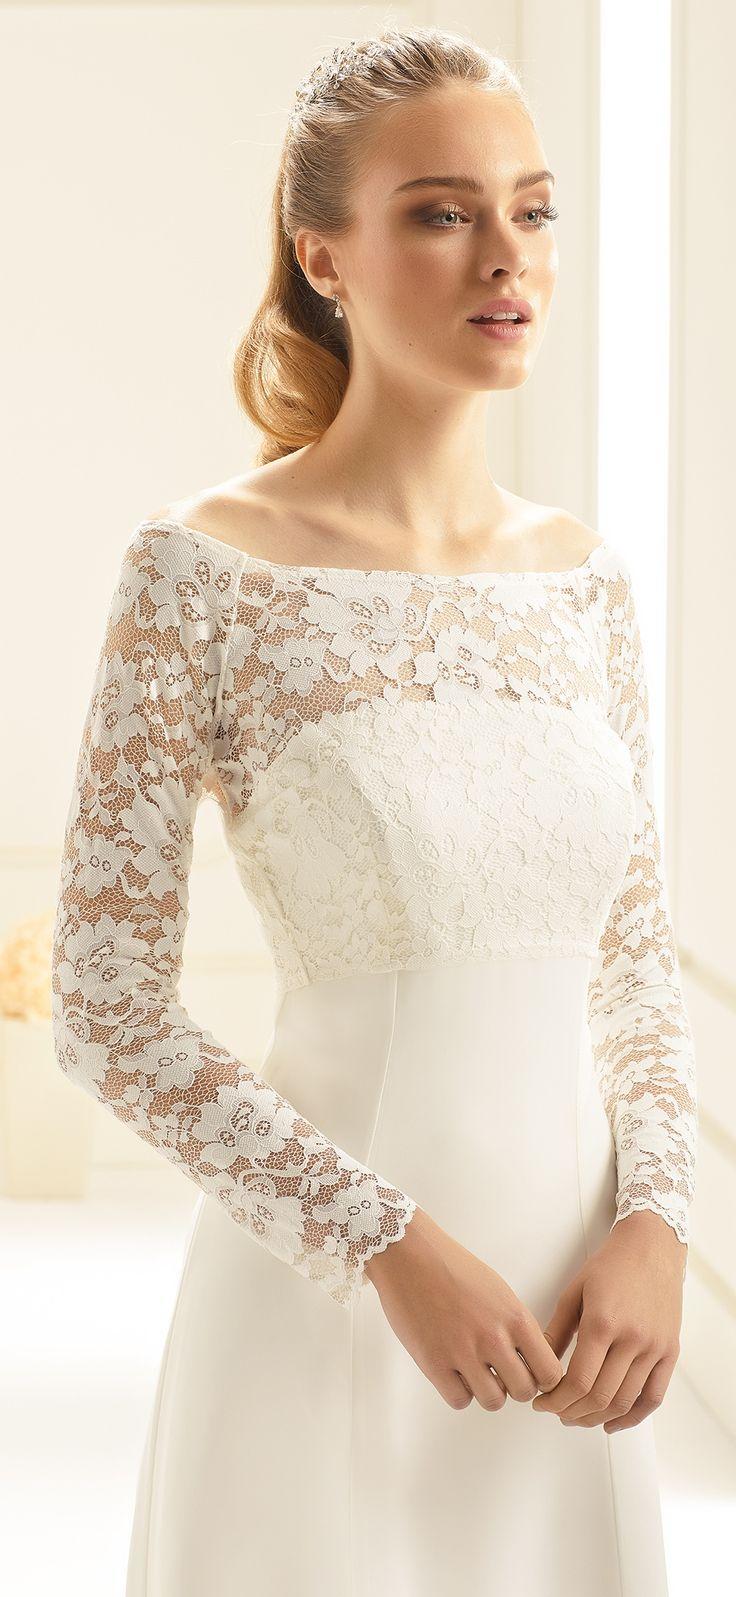 Our bolero E251 made for a winter bride! See more at bianco-evento.com #biancoevento #wedding #weddingdress #bridalwear #bridaccesorries #winterwedding #weddingideas